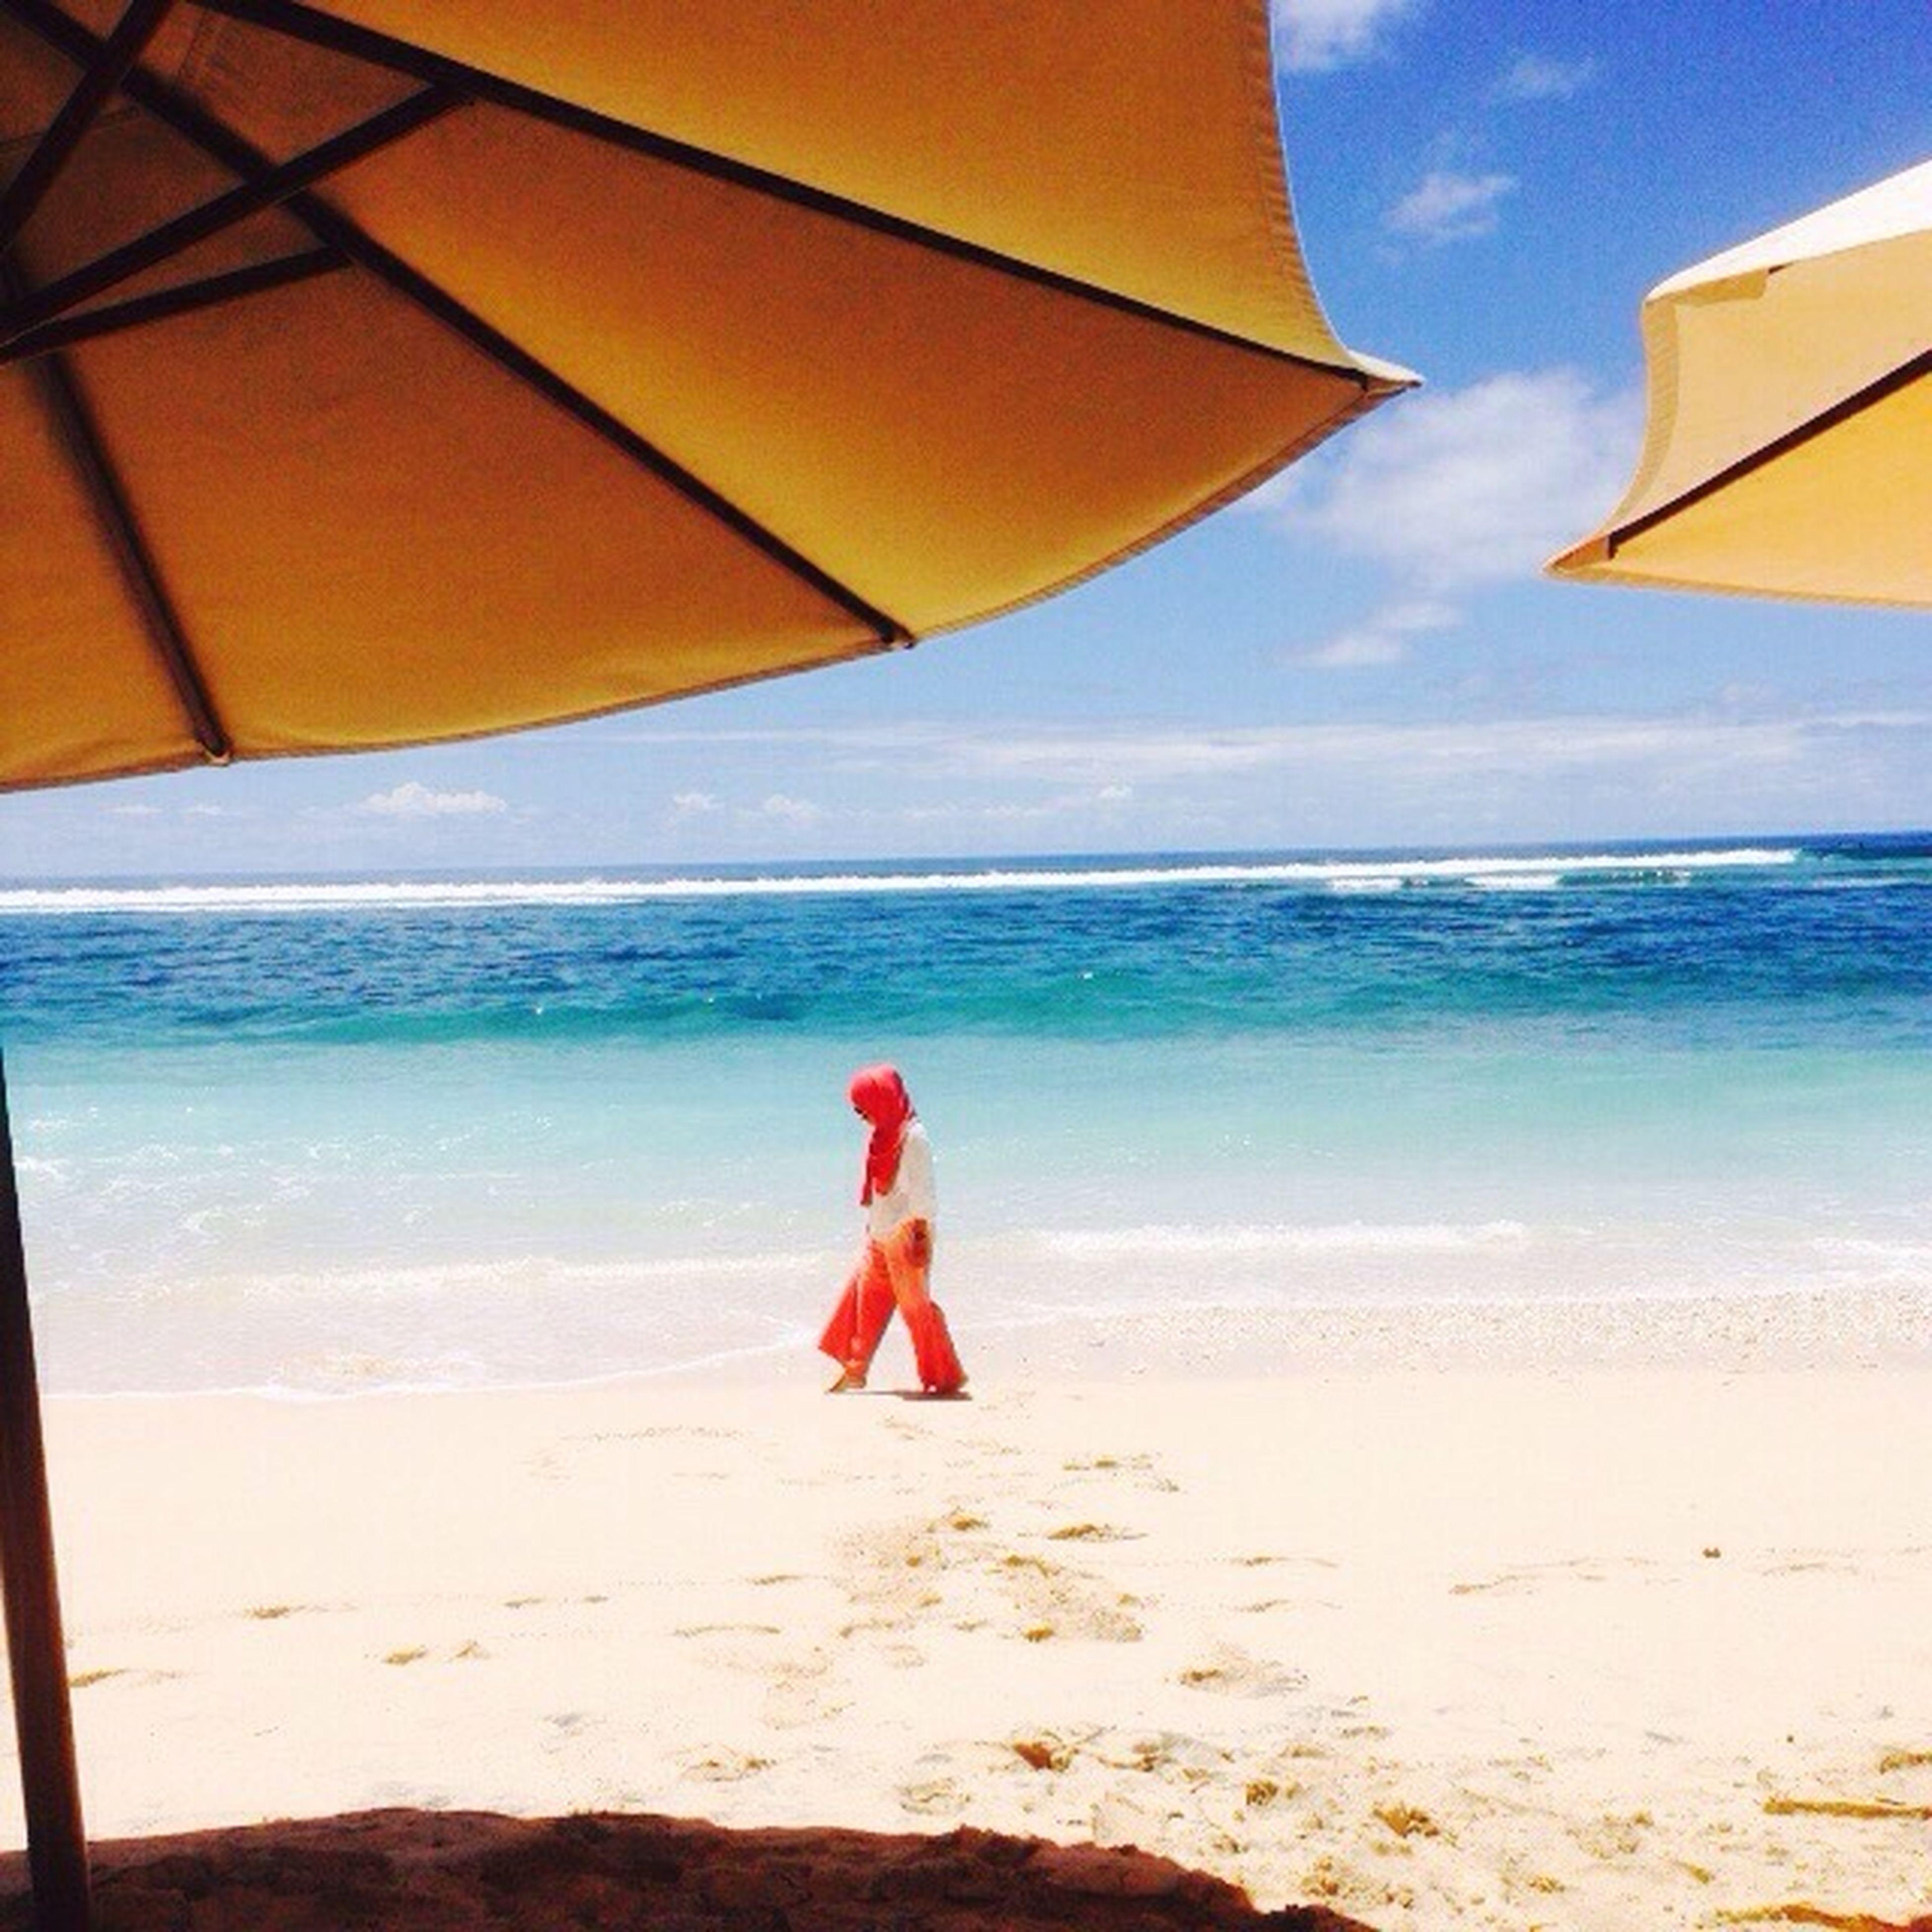 sea, horizon over water, beach, sky, beach umbrella, sand, shore, scenics, parasol, water, beauty in nature, vacations, umbrella, tranquility, tranquil scene, nature, cloud, summer, sunlight, idyllic